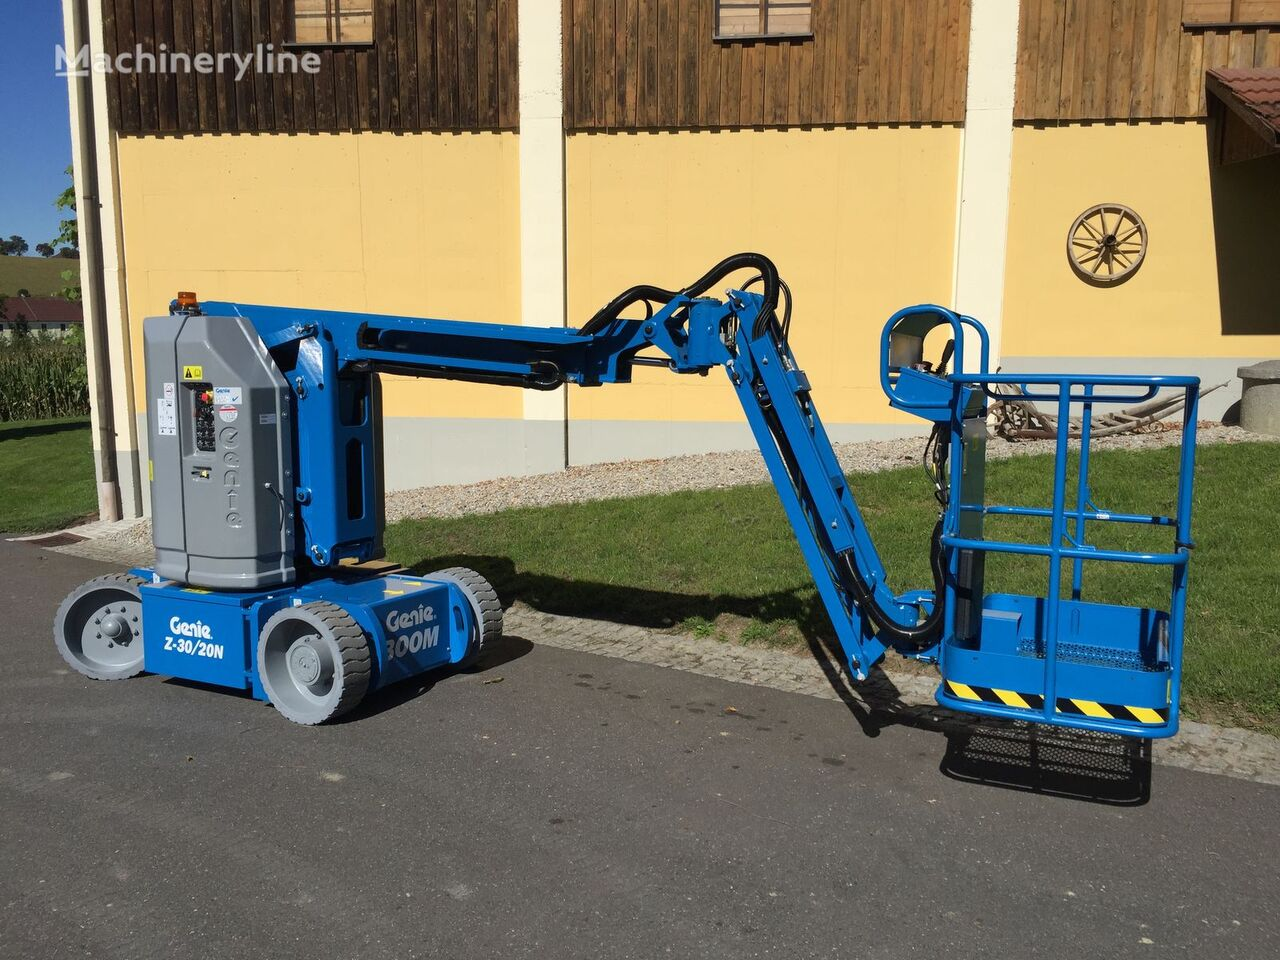 new GENIE Z30/20N RJ articulated boom lift